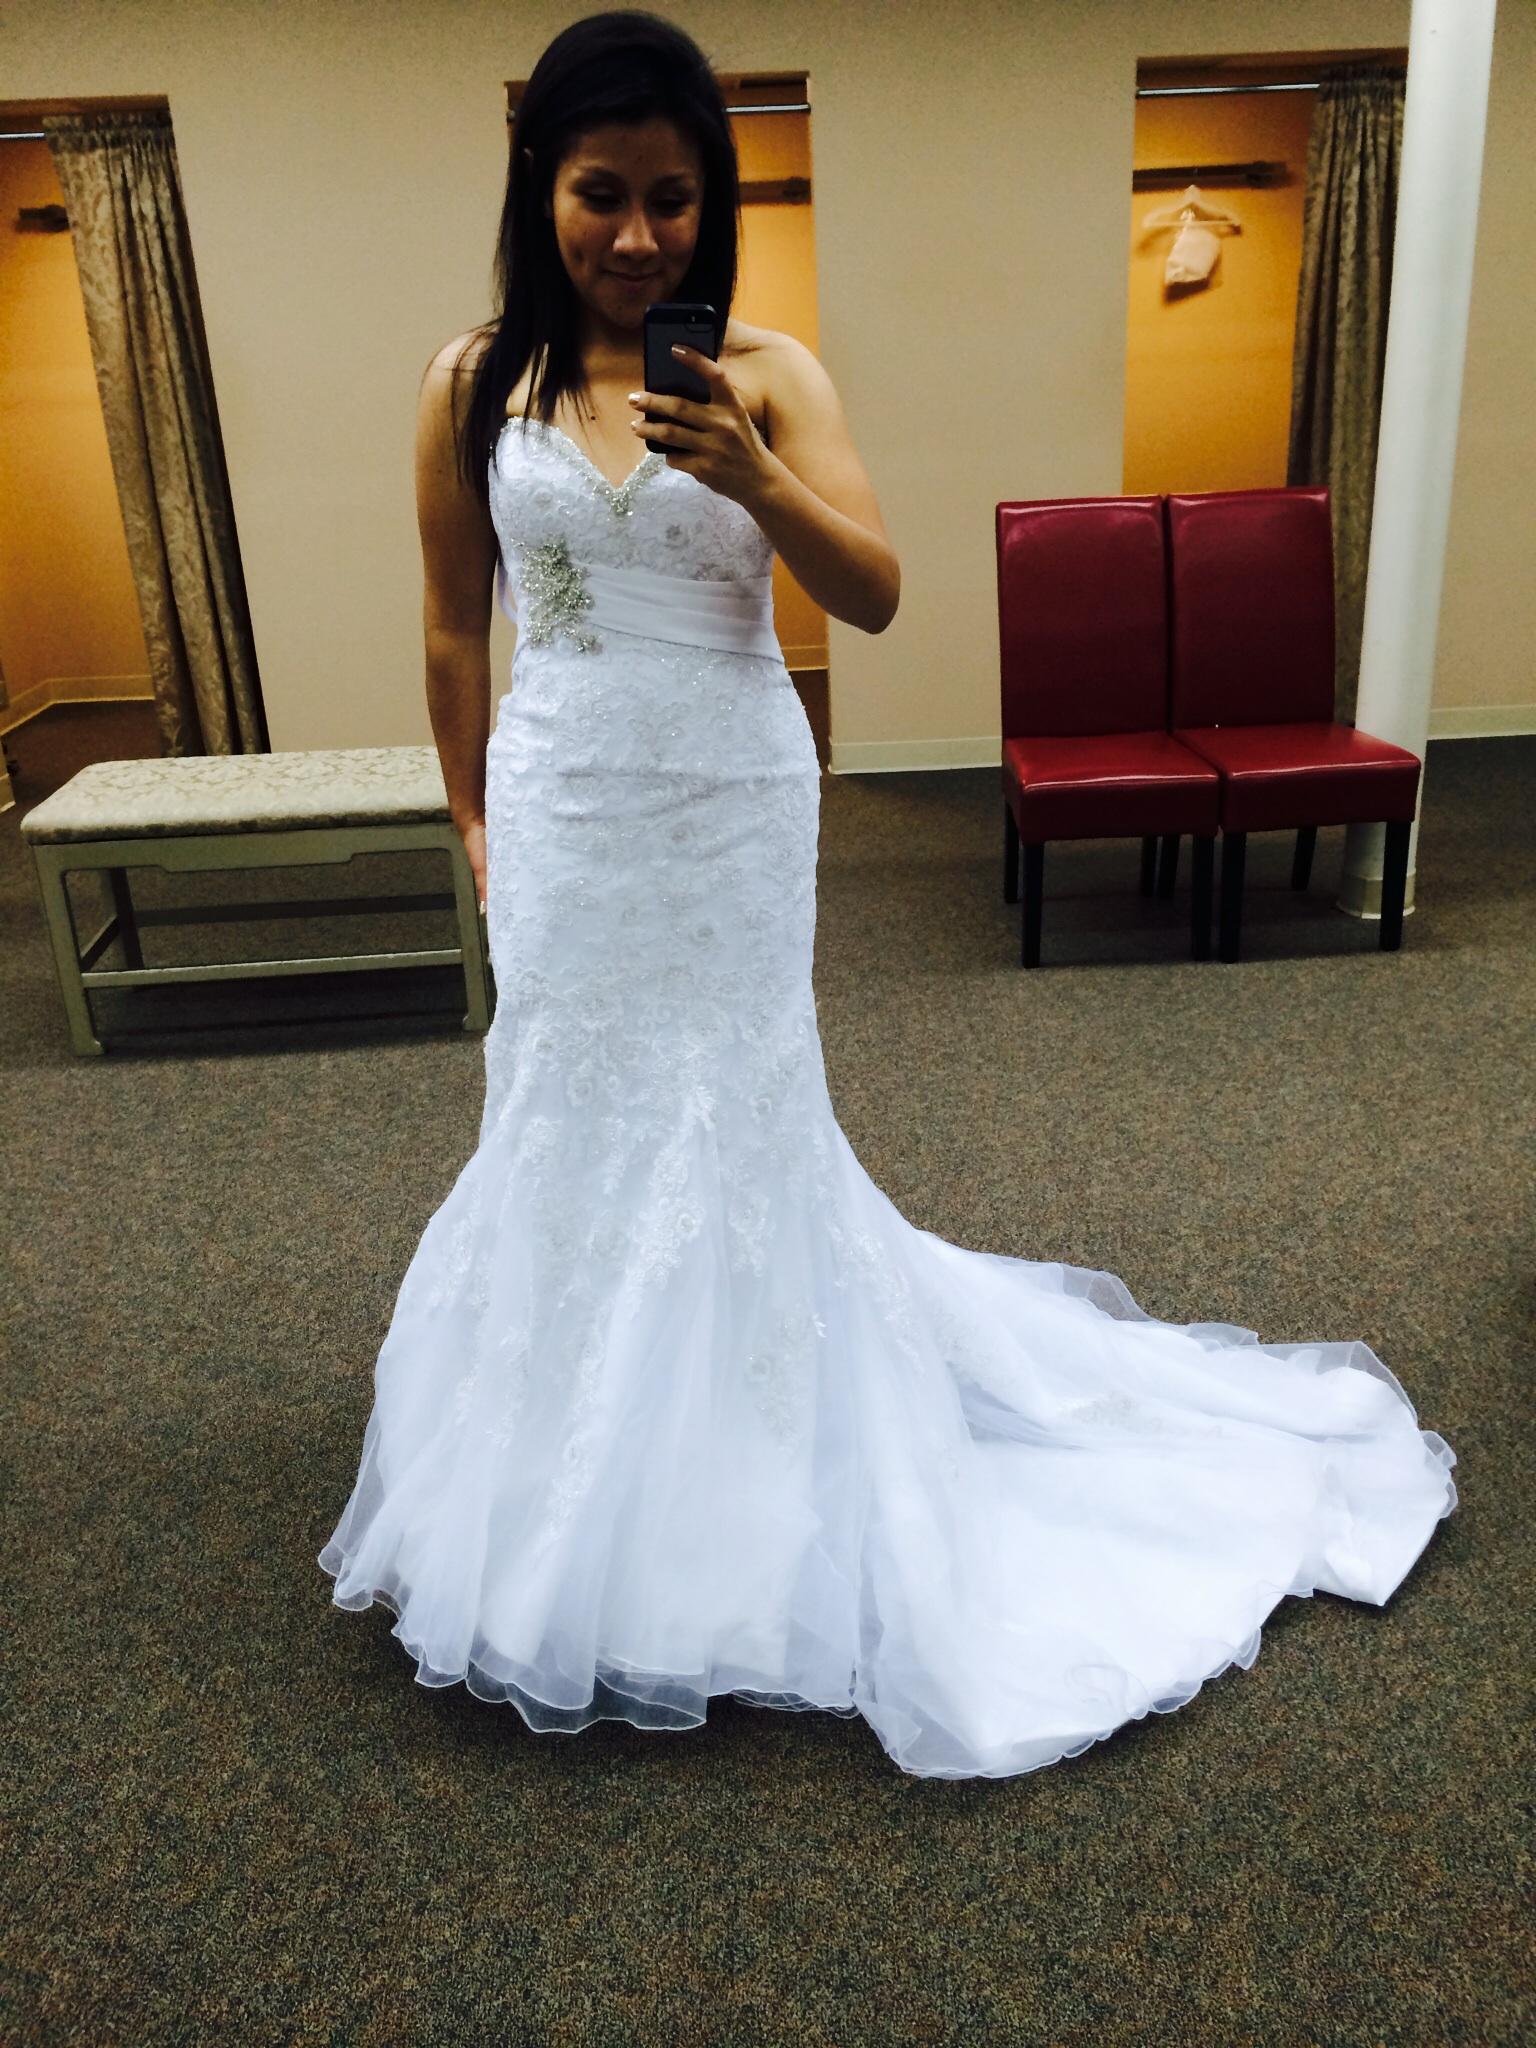 petite brides show me your trumpetfit and flare wedding dress petite wedding dress Petite brides show me your trumpet fit and flare wedding dress